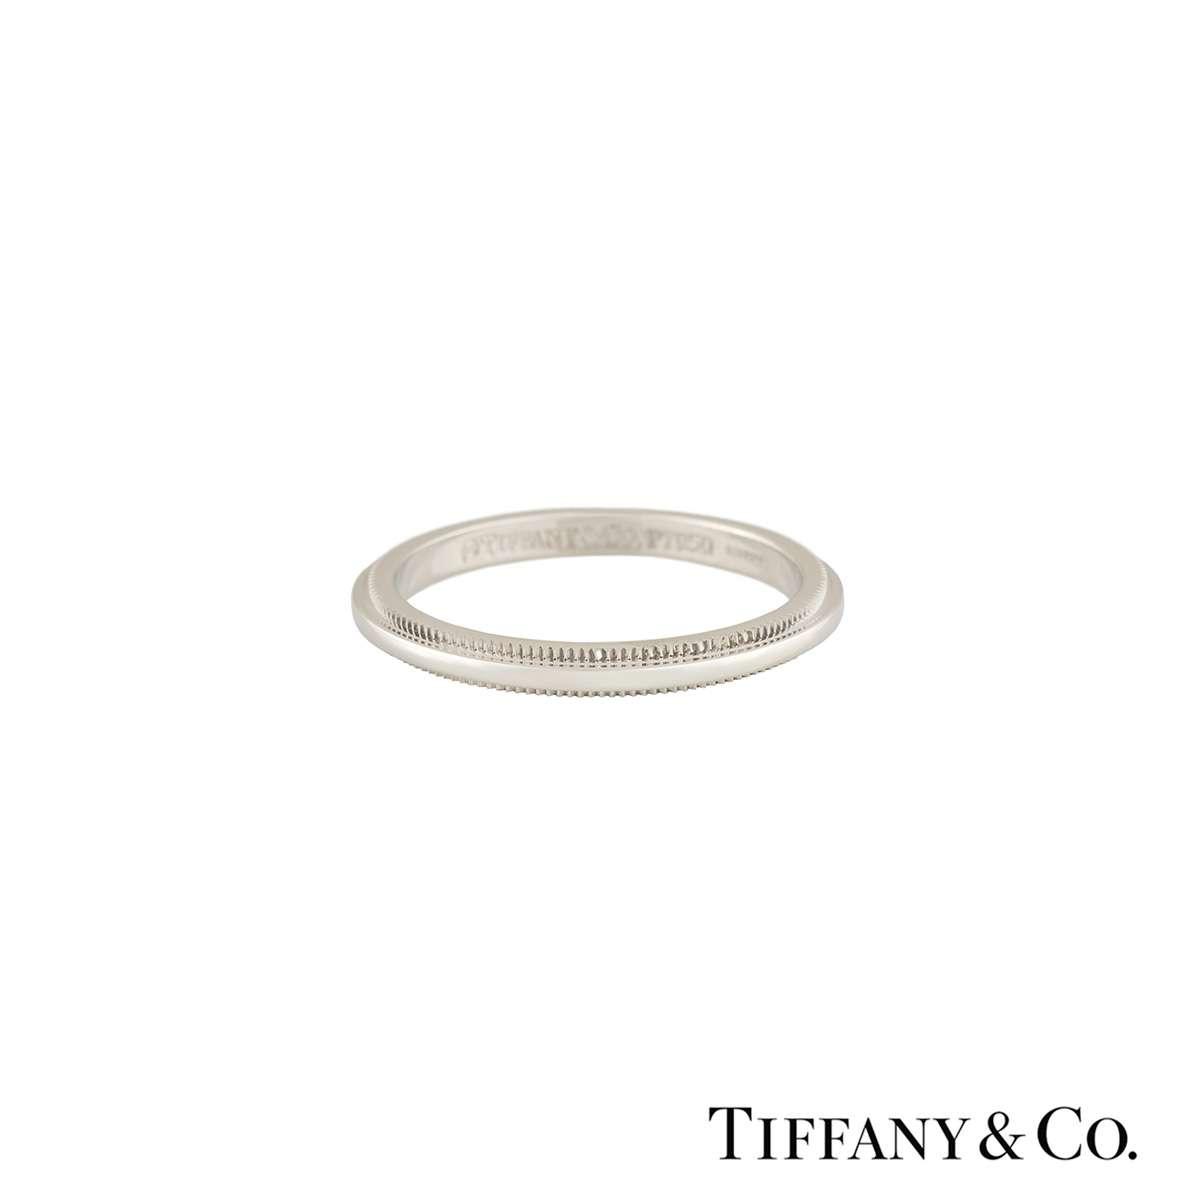 Tiffany Co Platinum Lucida 2mm Wedding Band Ring Sz 8: Tiffany & Co. Classic Wedding Band